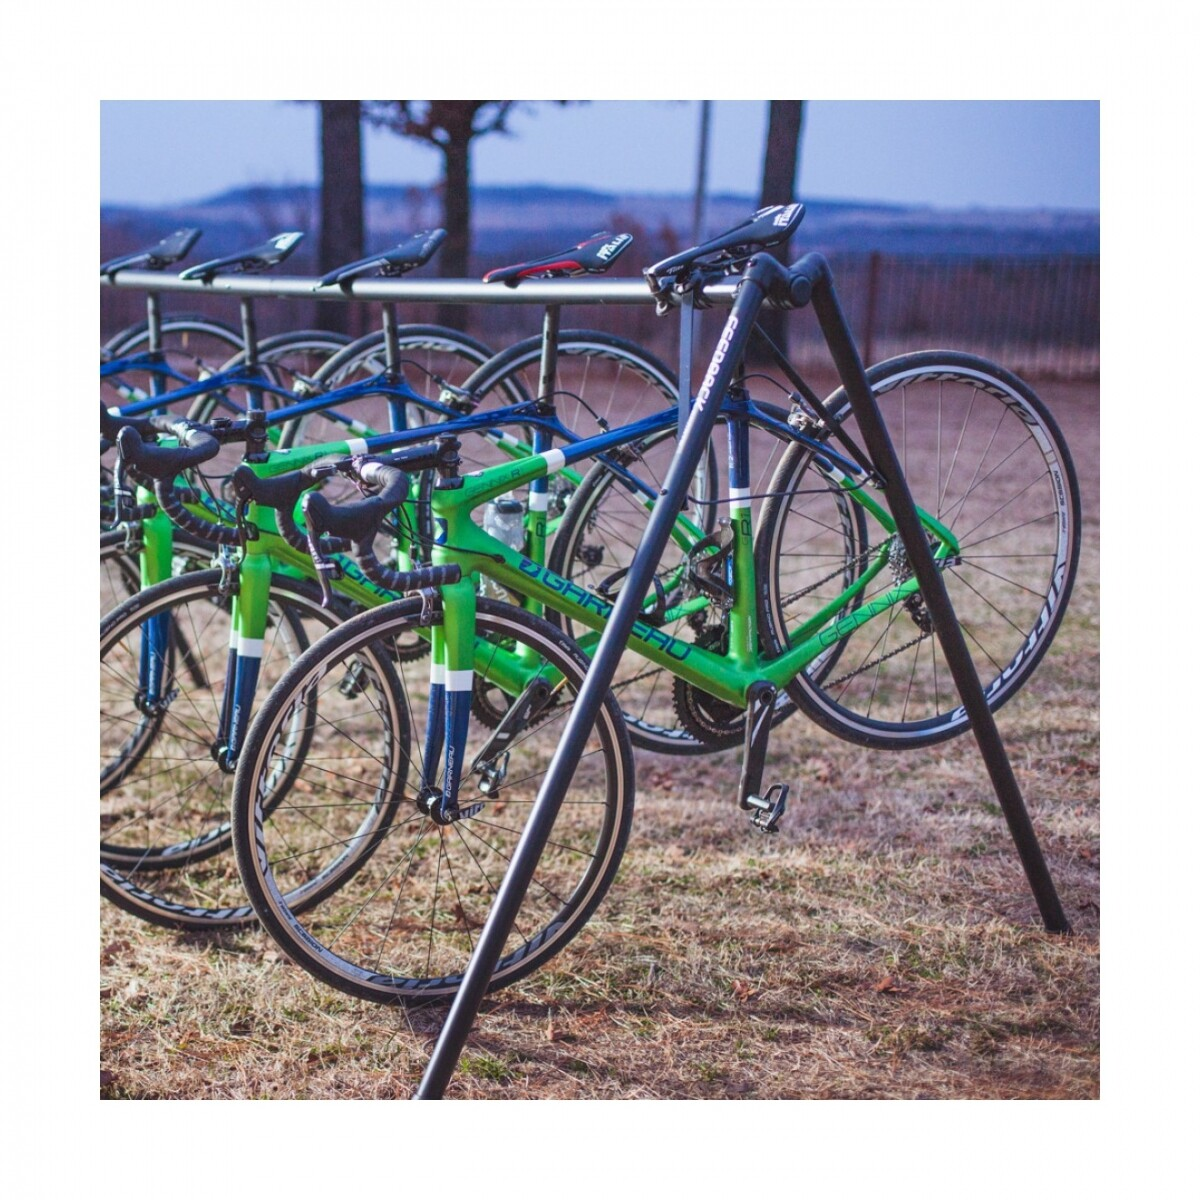 6 bike stand